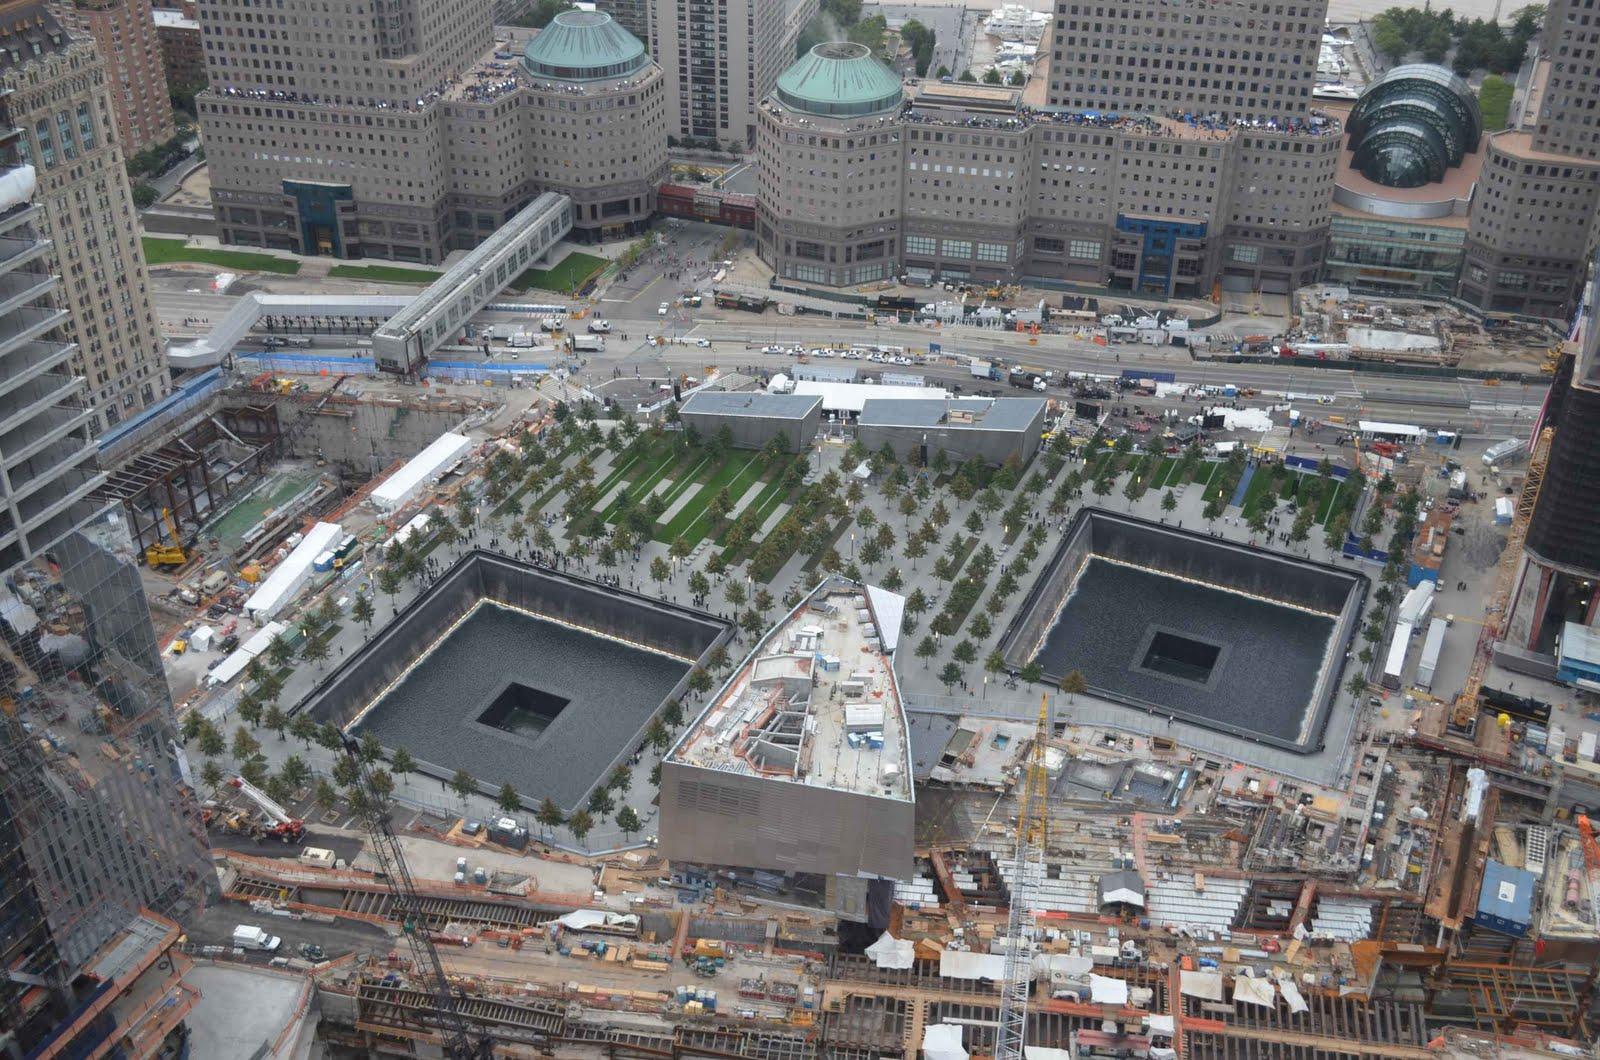 Image Ground Zero Download b topsy.one